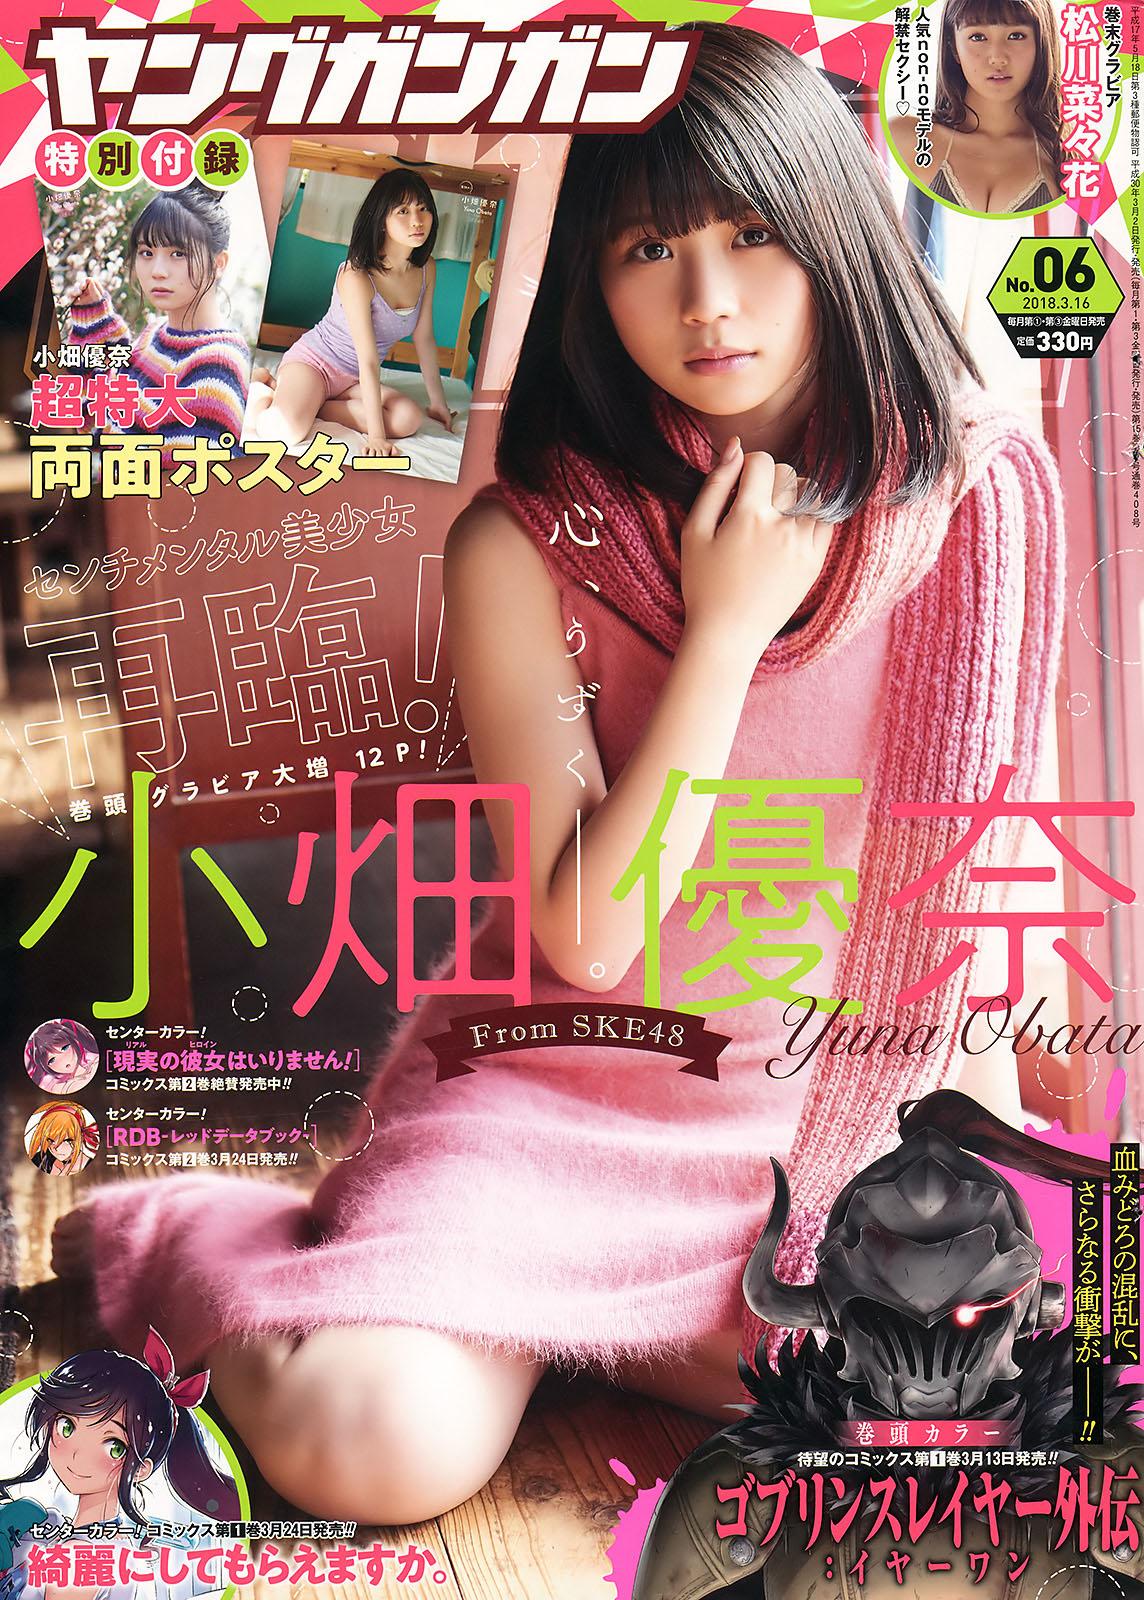 Obata Yuna 小畑優奈, Young Gangan 2018 No.06 (ヤングガンガン 2018年6号)